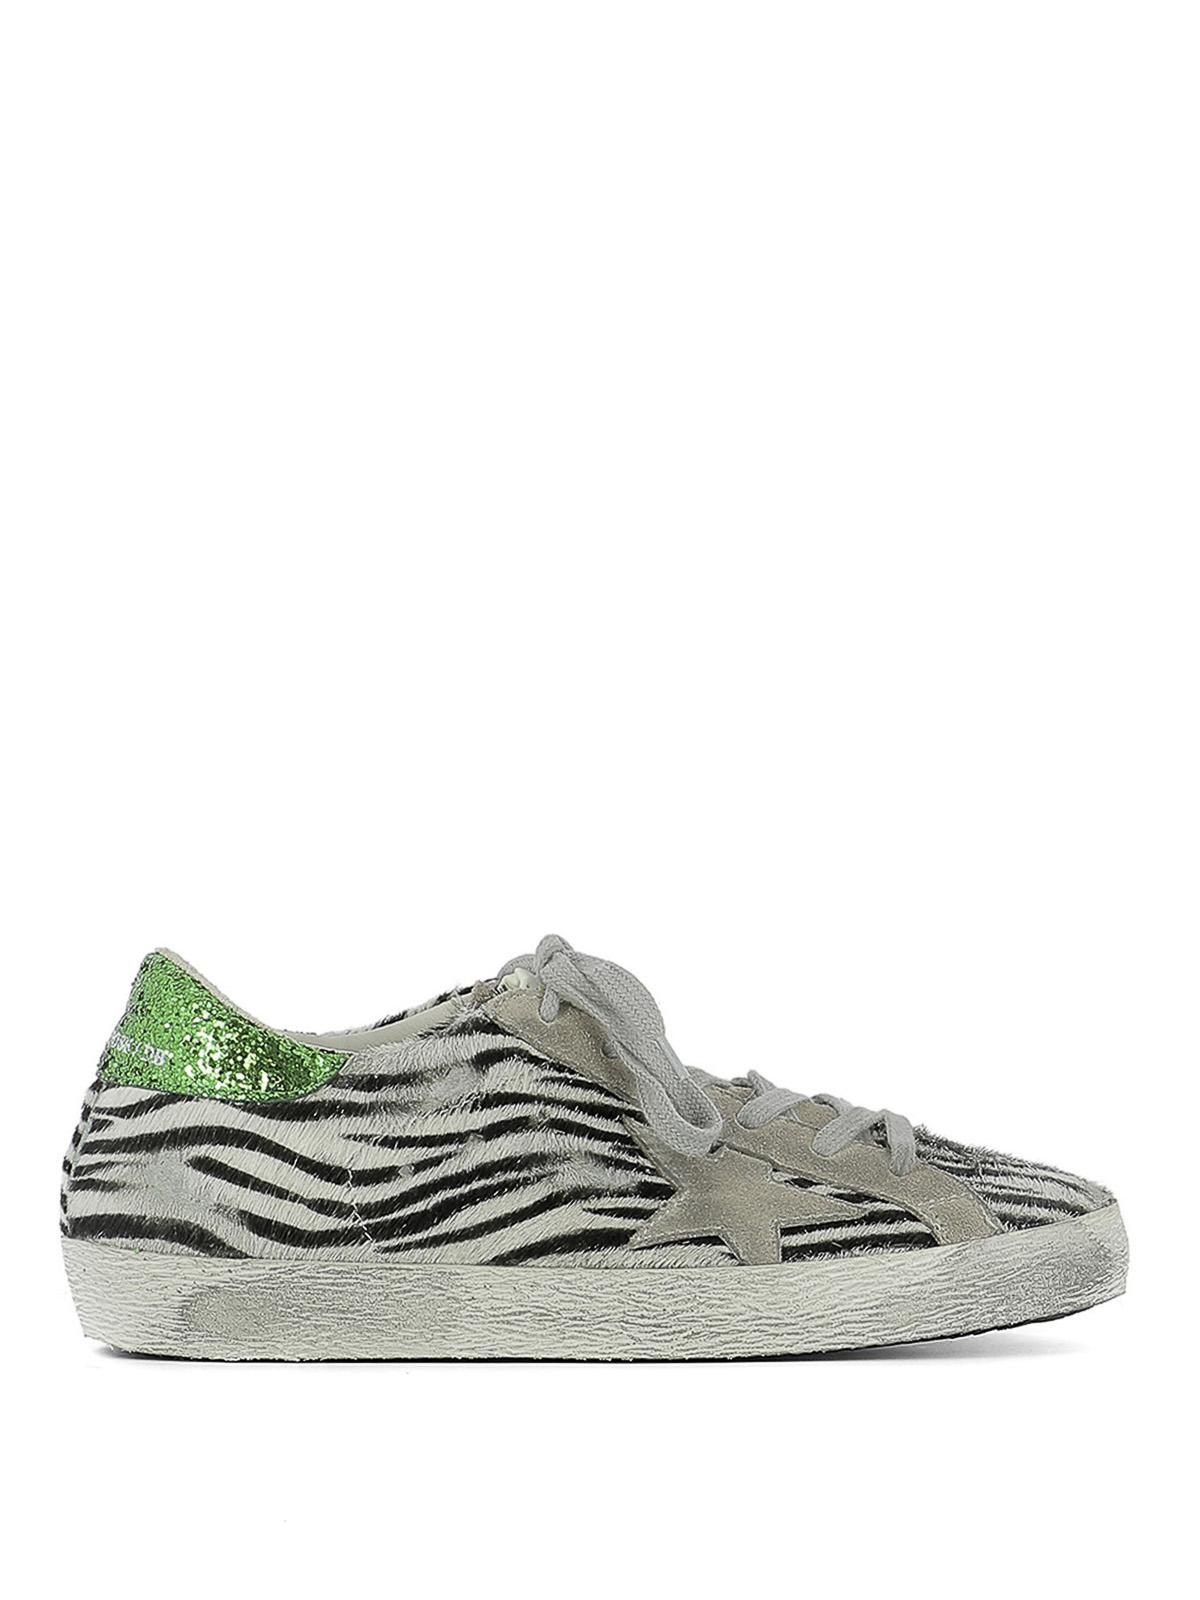 Superstar zebra pony hair sneakers